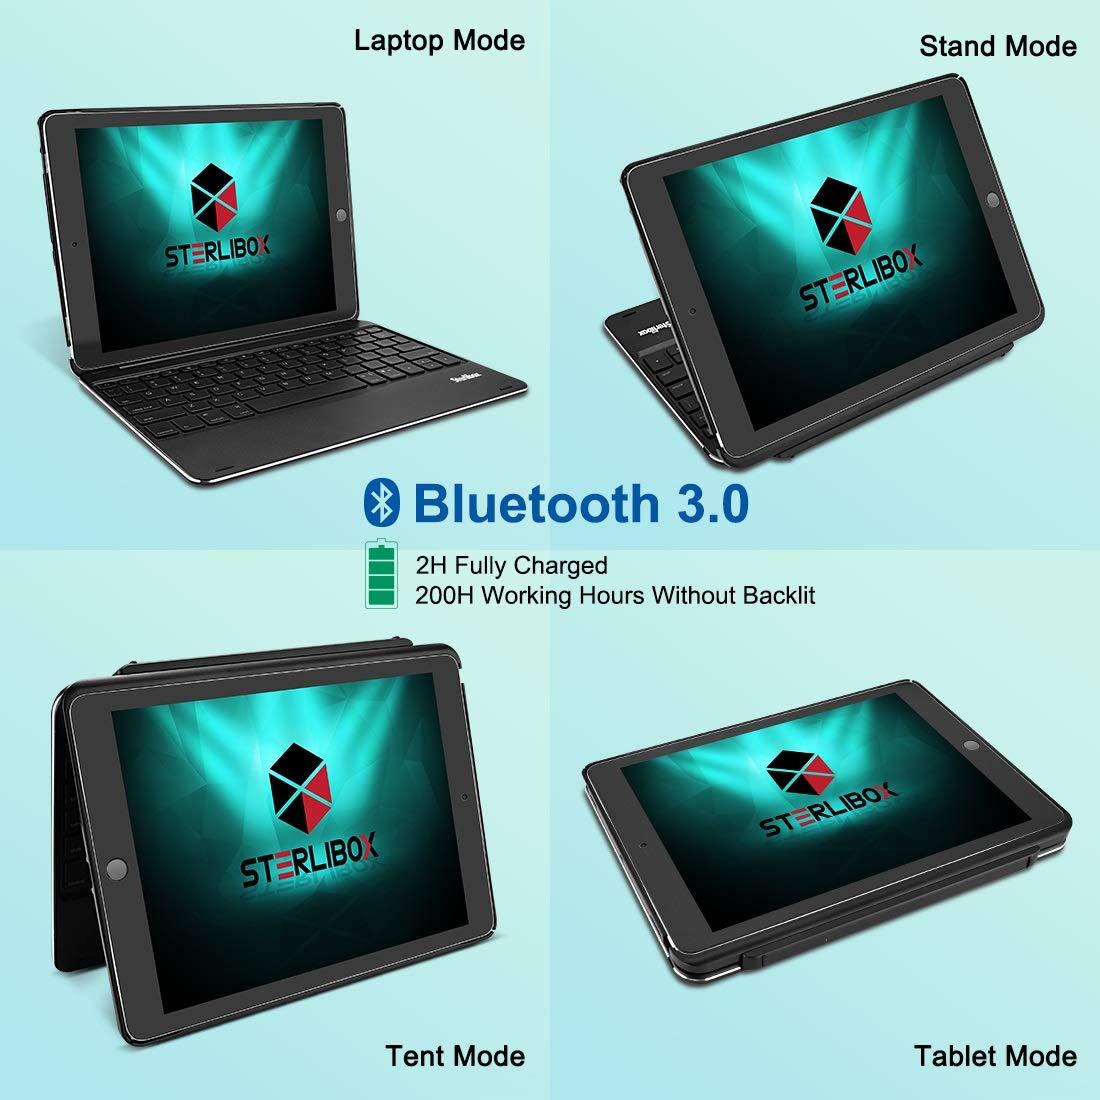 iPad Keyboard Case for The 2018 iPad (6th Gen), 2017 iPad (5th Gen), iPad Pro 9.7, iPad Air 1 - Auto Sleep/Wake - Detachable & Quiet - 7 Color Backlit - Wireless/Bluetooth - iPad Case with Keyboard by Sterlibox (Image #3)